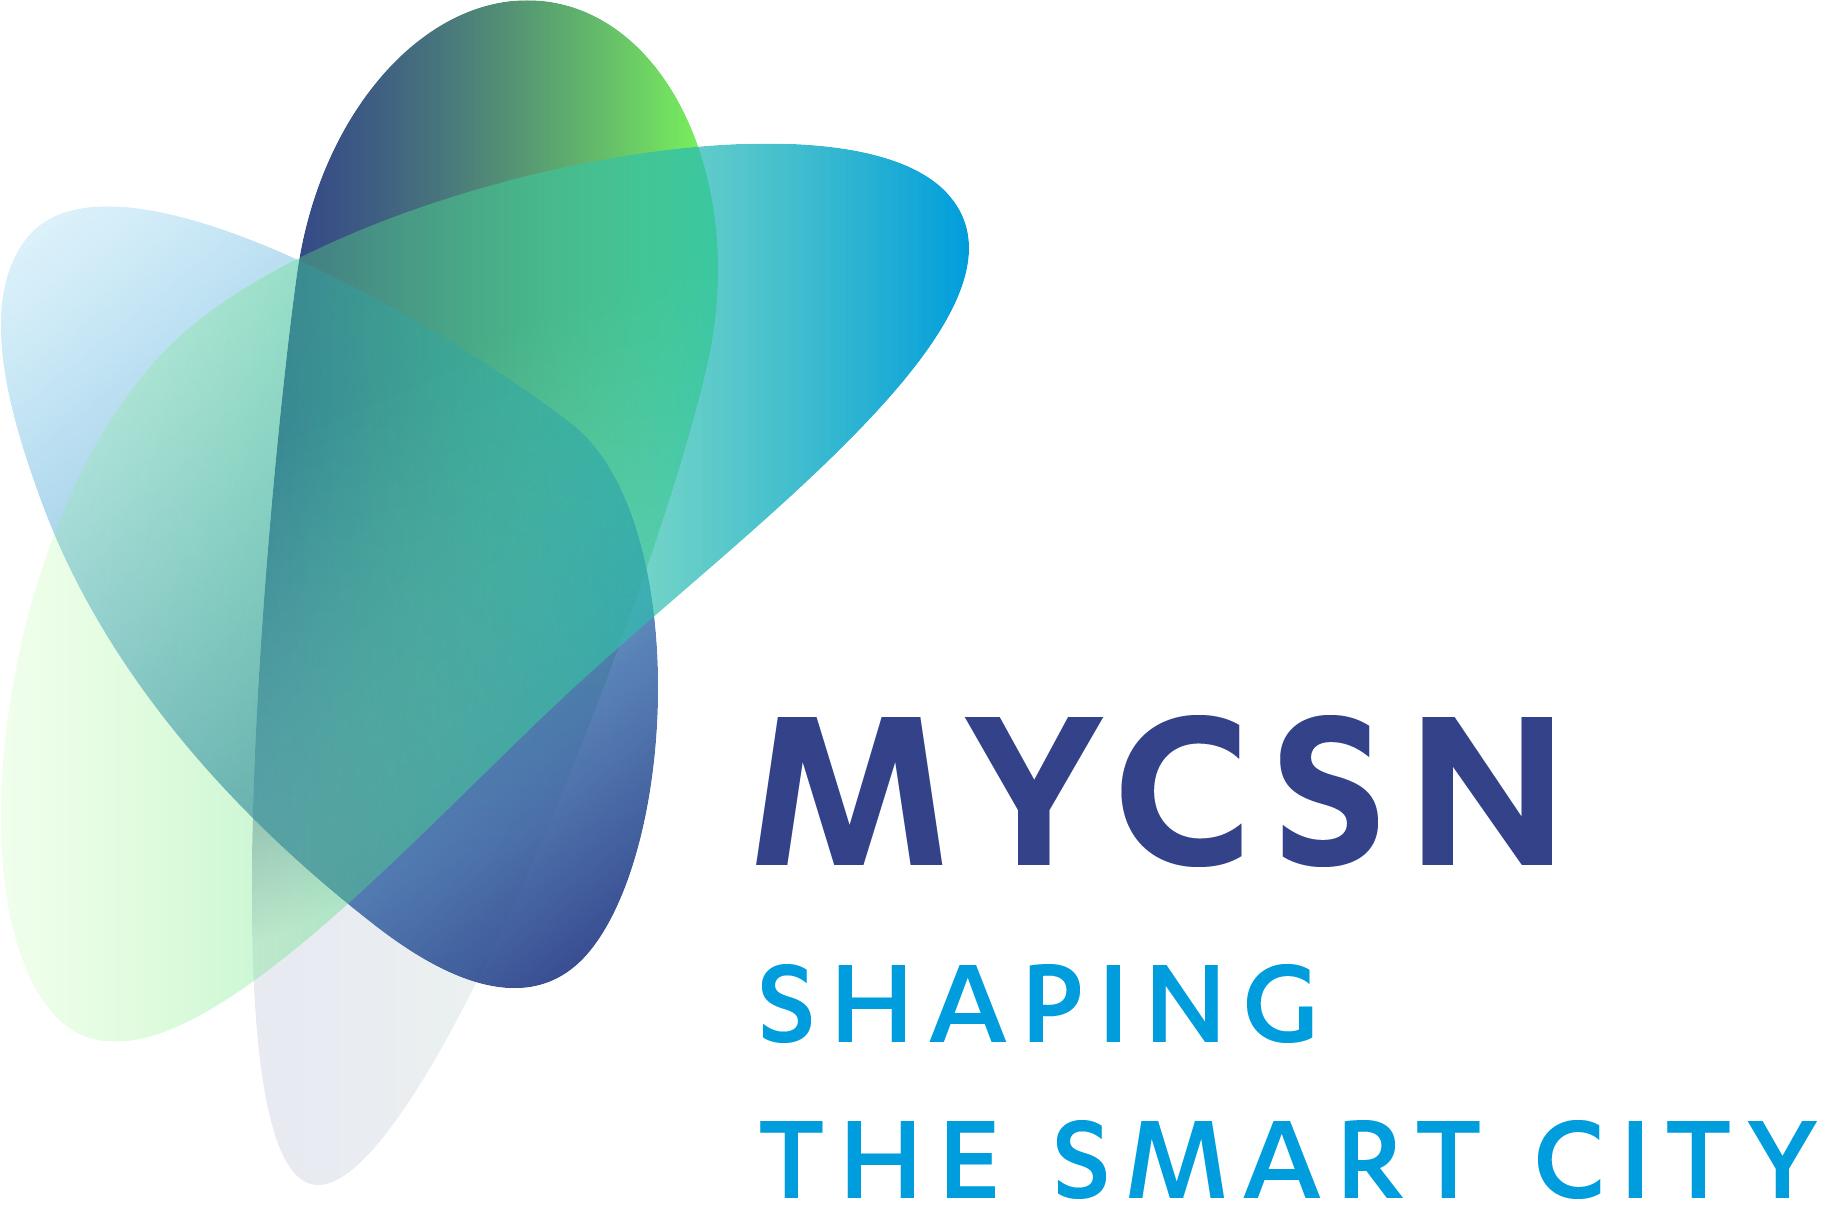 MyCSN NV on Databroker